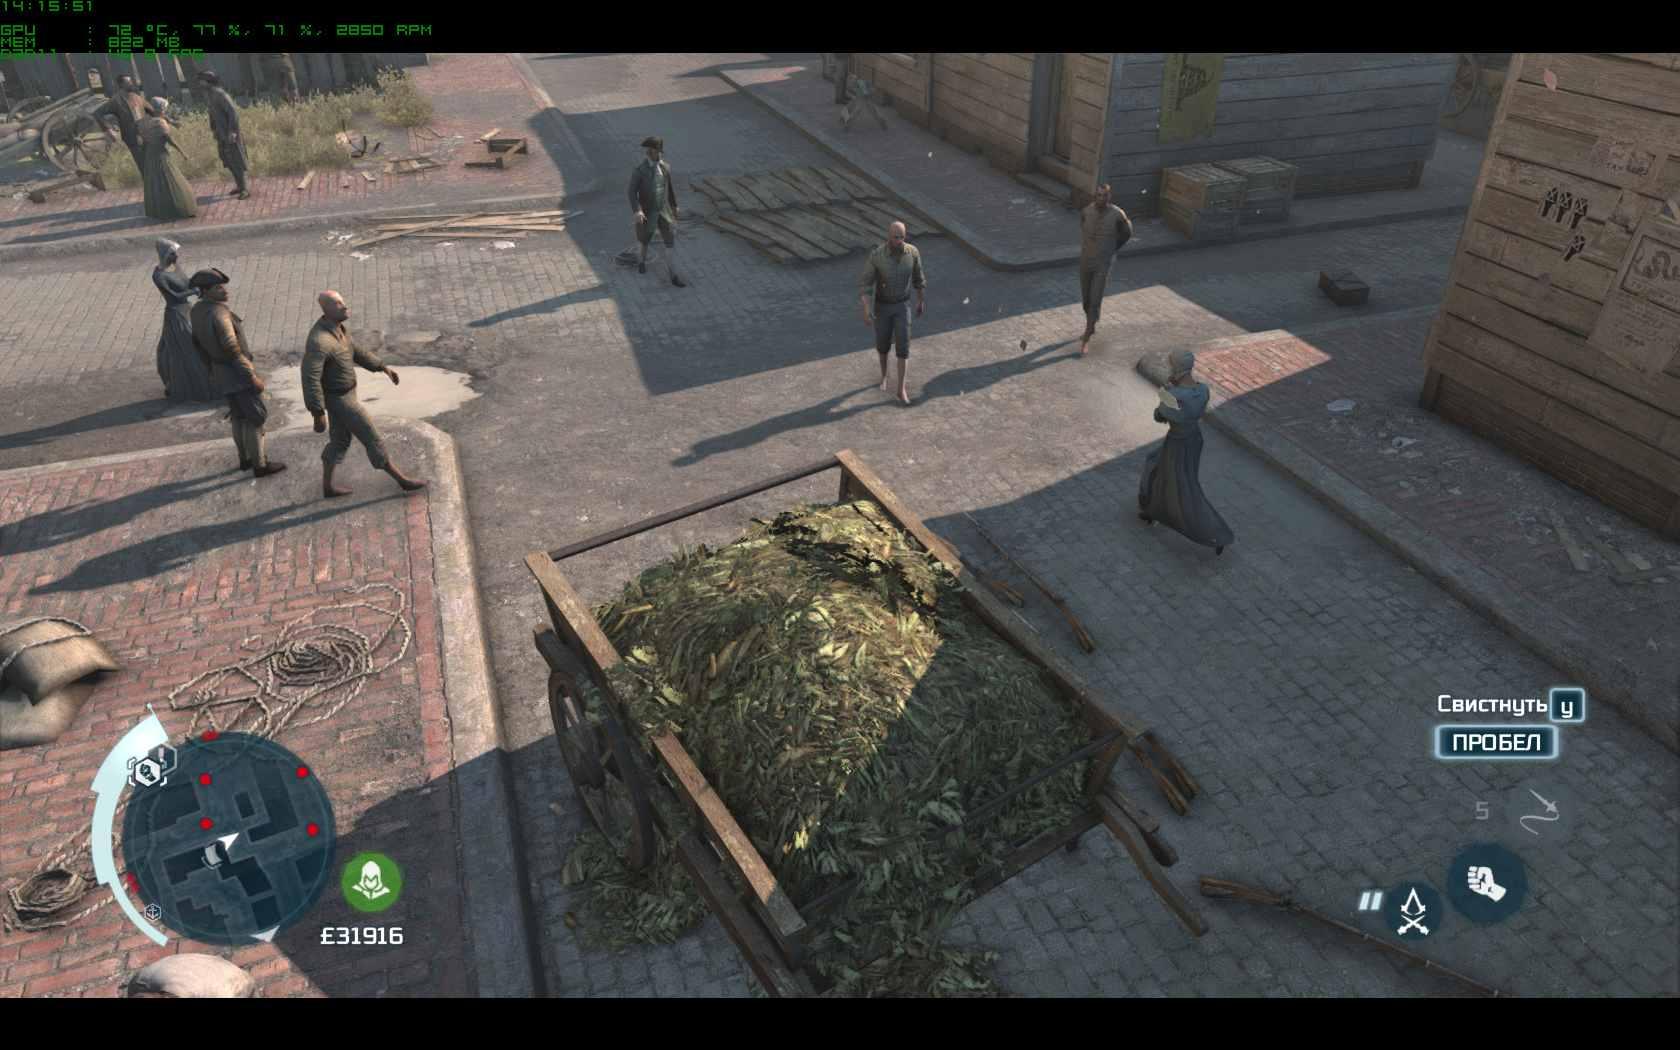 AC3SP_2013_11_24_14_15_52_376.jpg - Assassin's Creed 3